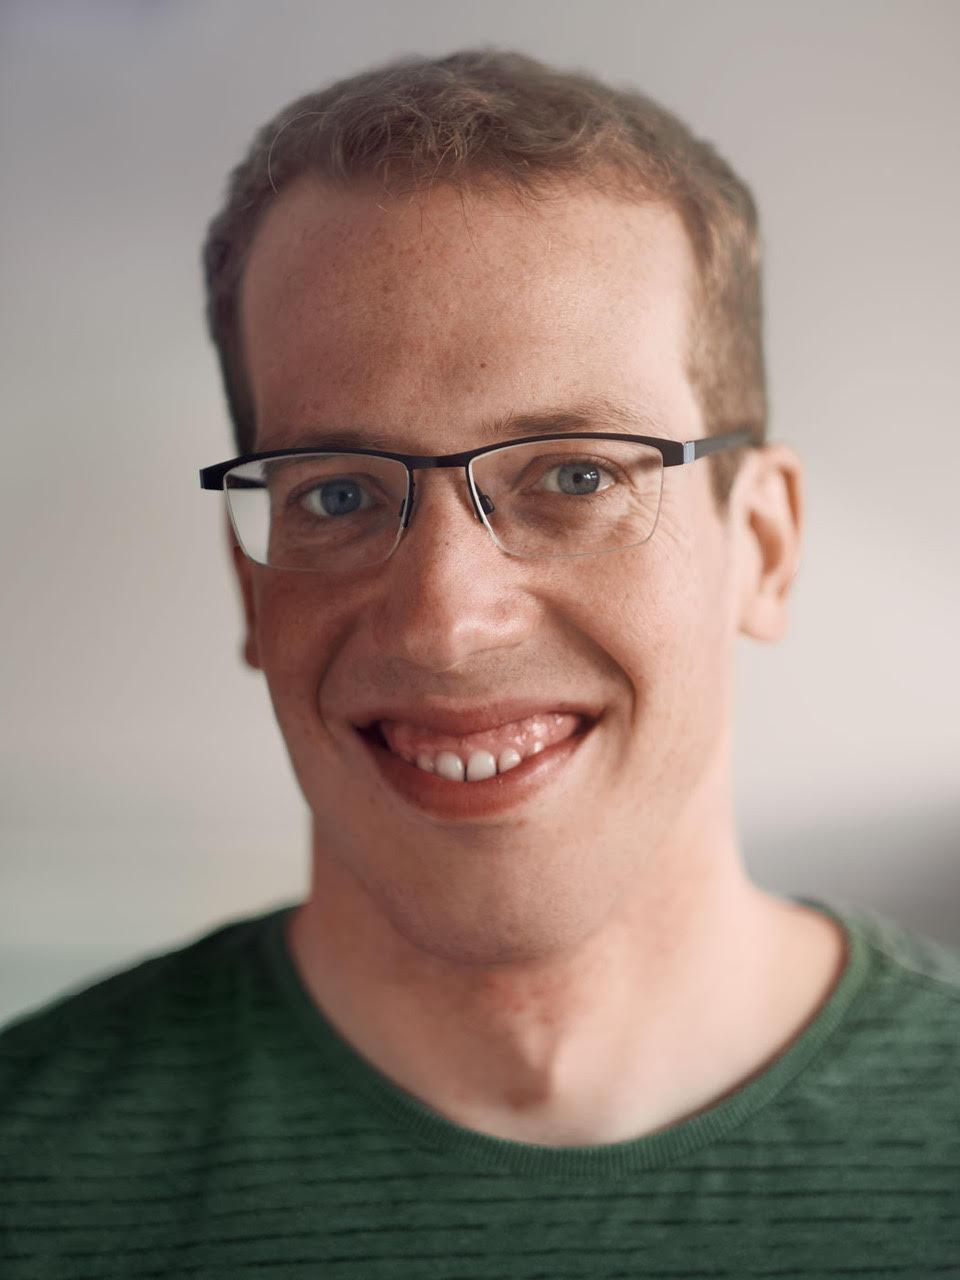 Marvin Hagemeister